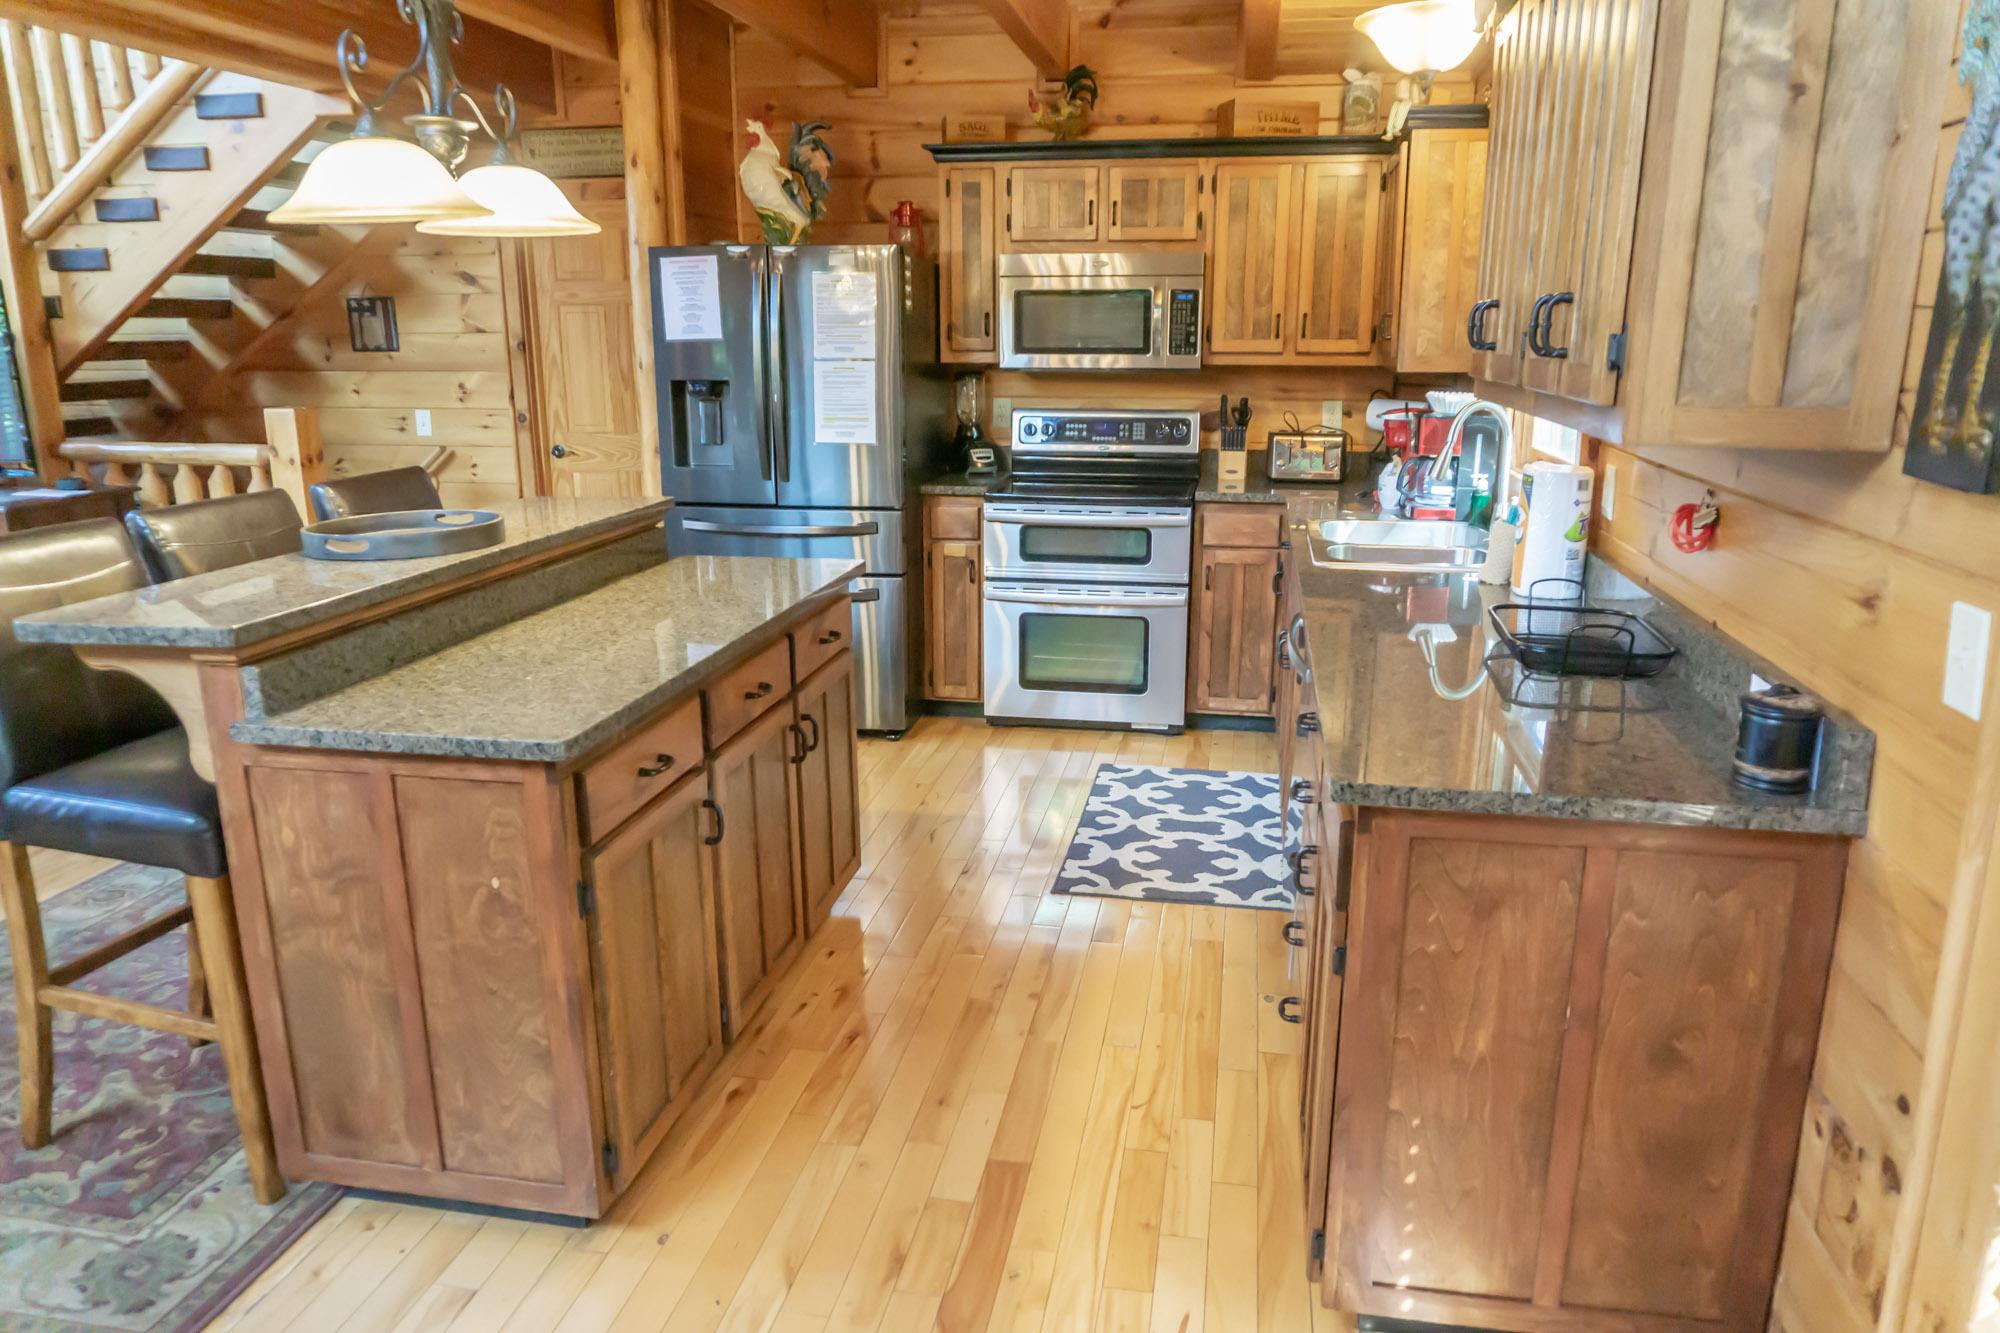 Granite countertops, double oven, large refrigerator & more